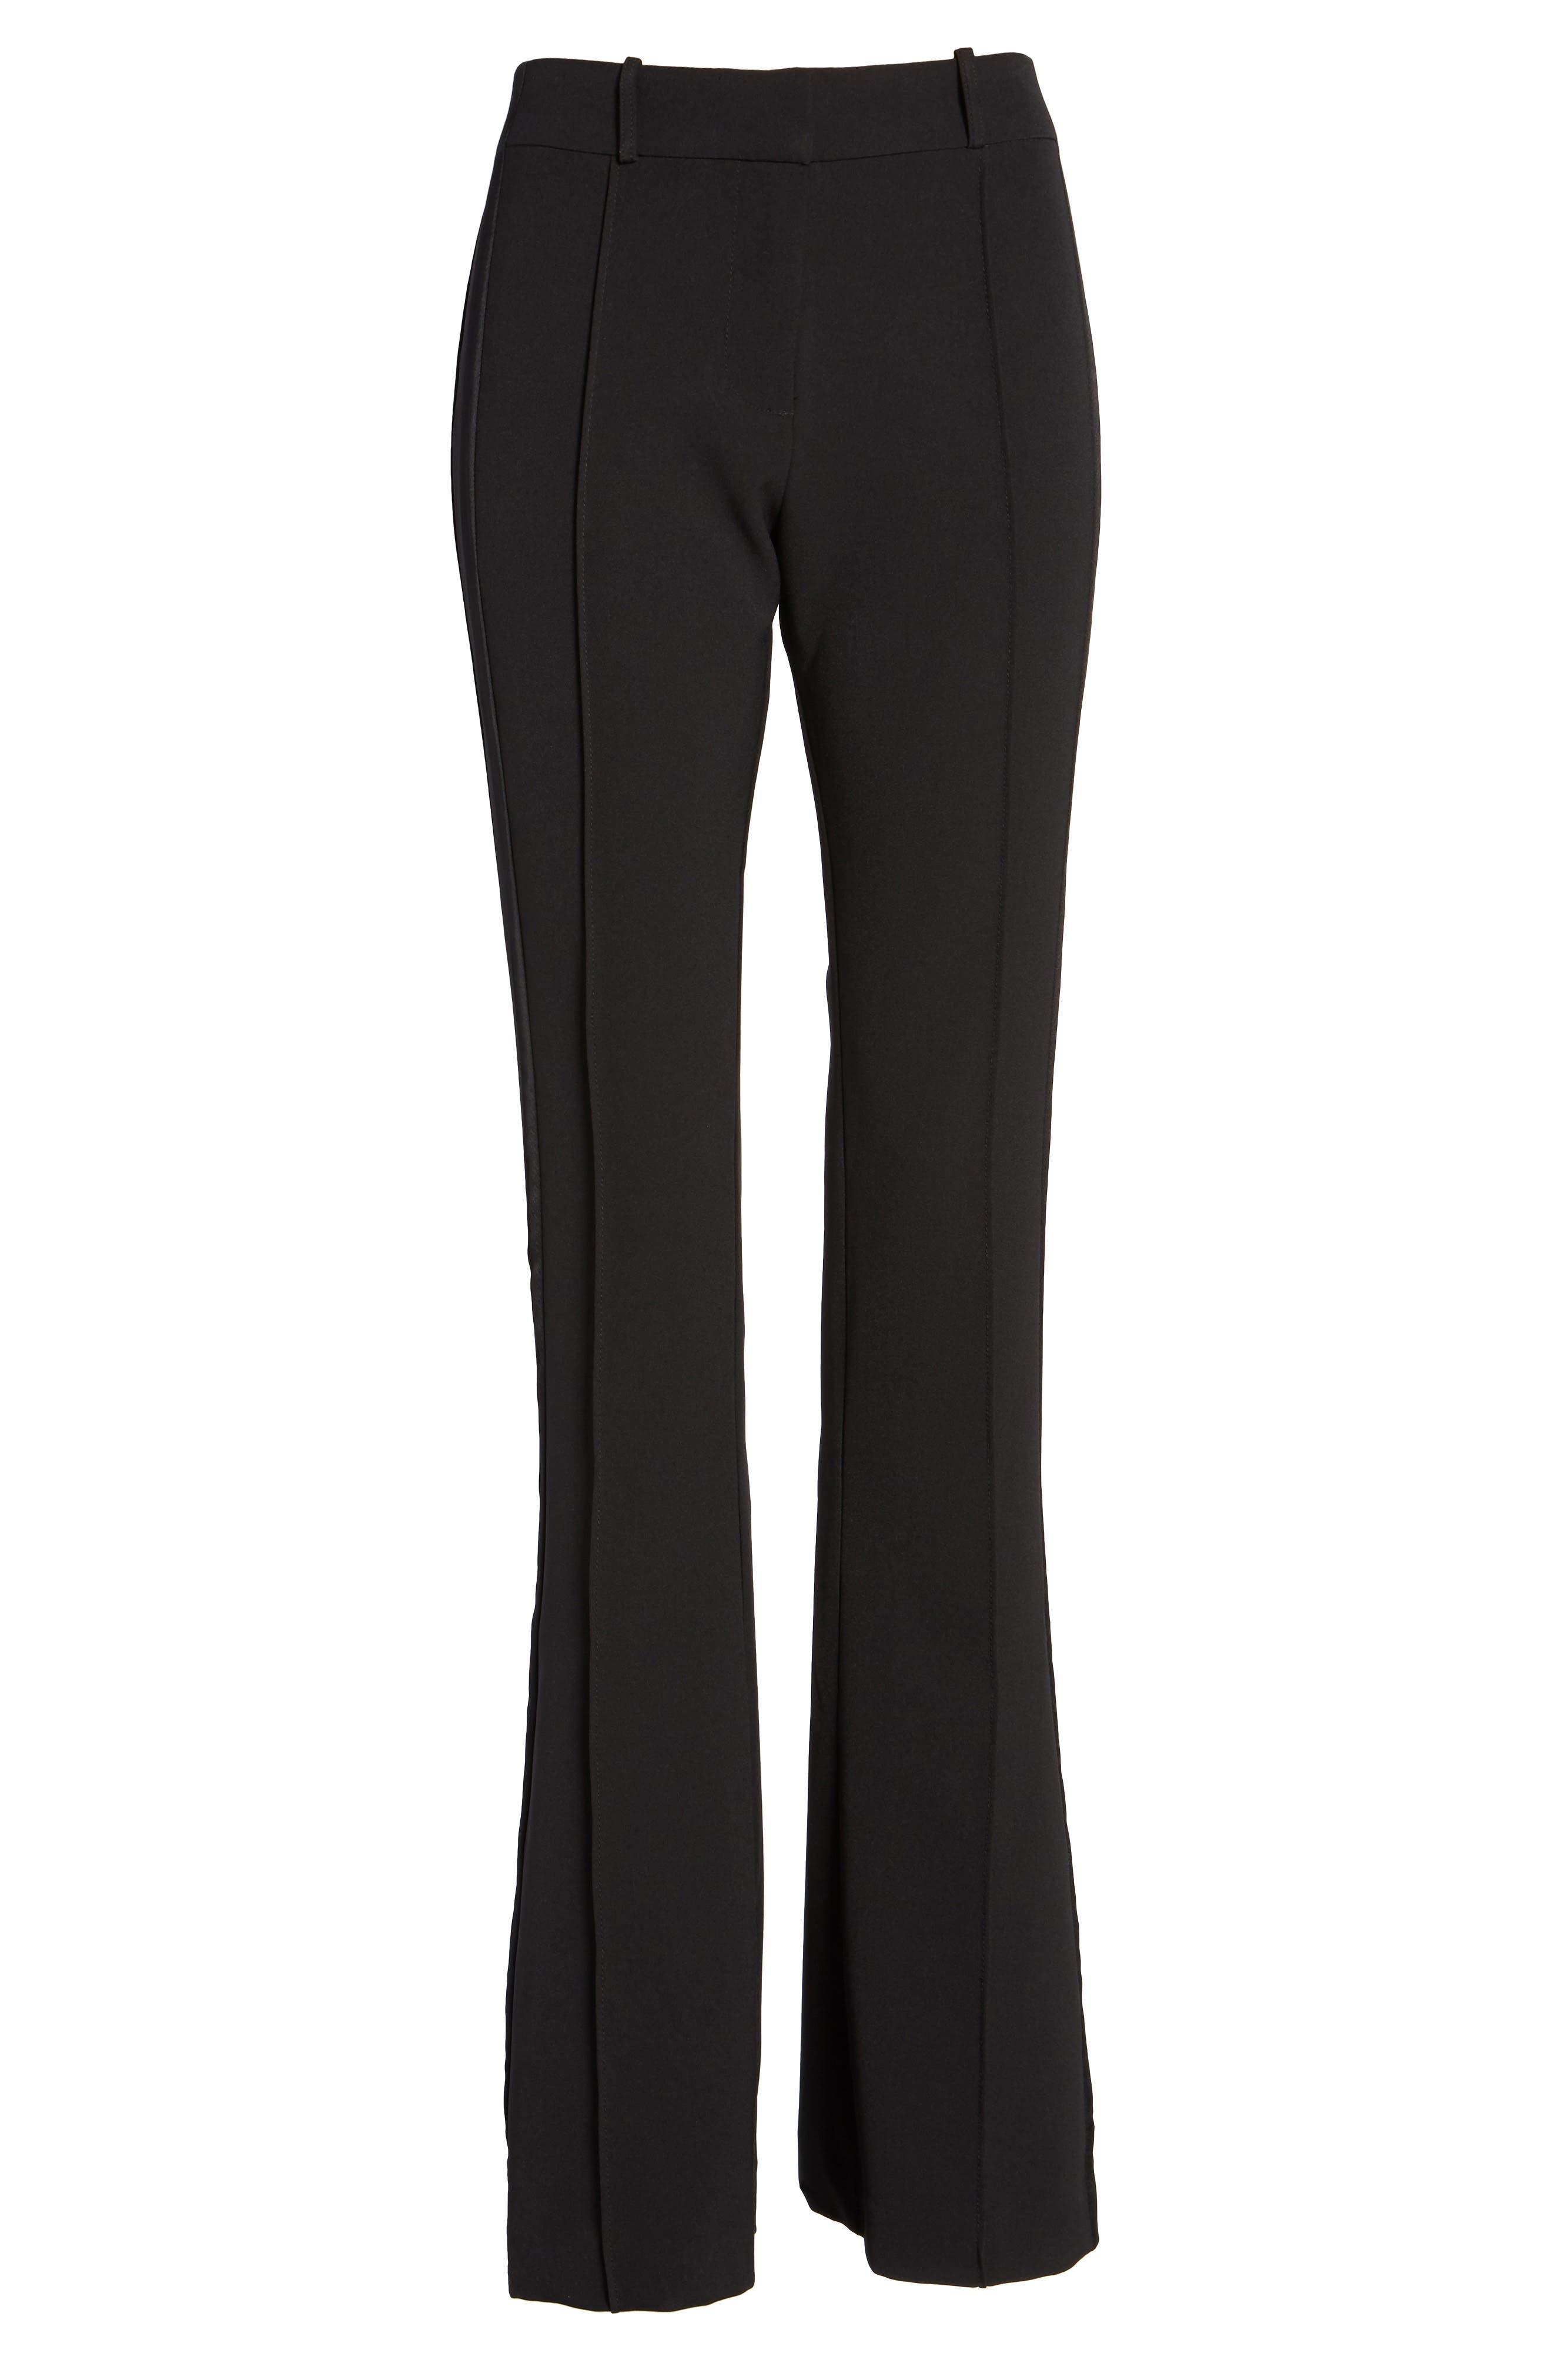 Roxy Flare Leg Pants,                             Alternate thumbnail 6, color,                             001